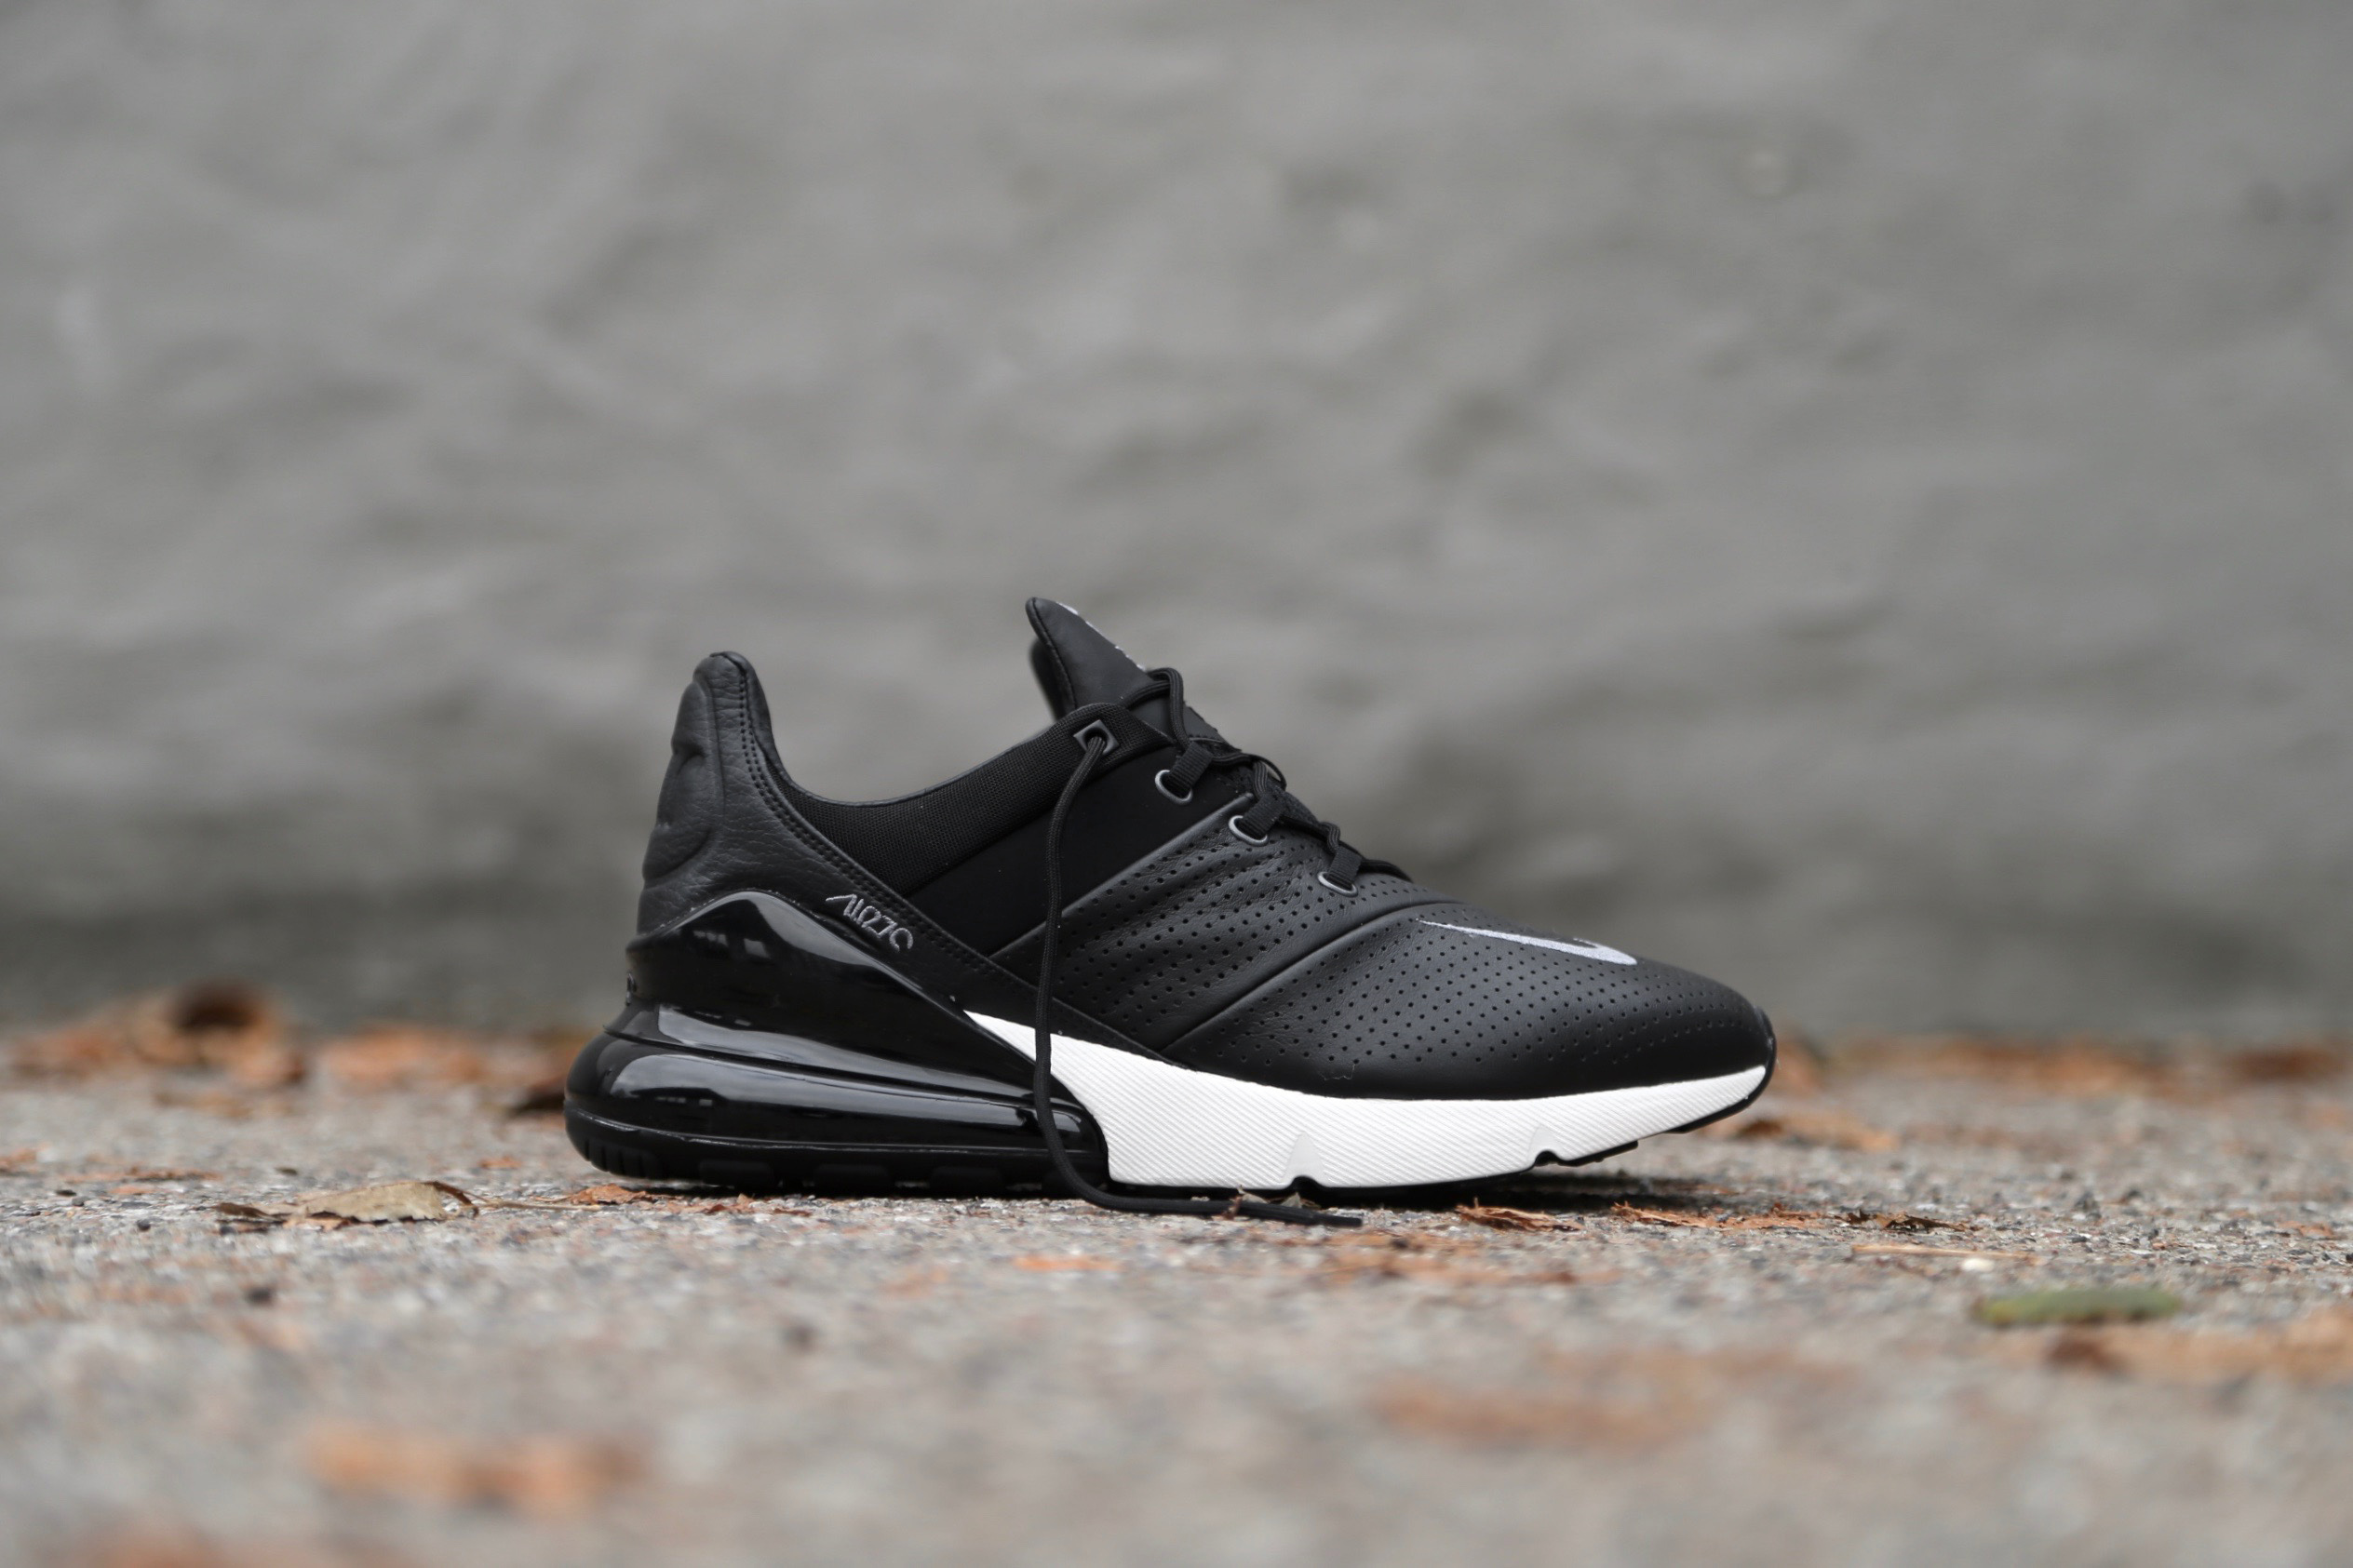 check out ac46f 9aa87 Nike Air Max 270 Premium - Black / Sail / Metallic Cool Grey / Light Carbon